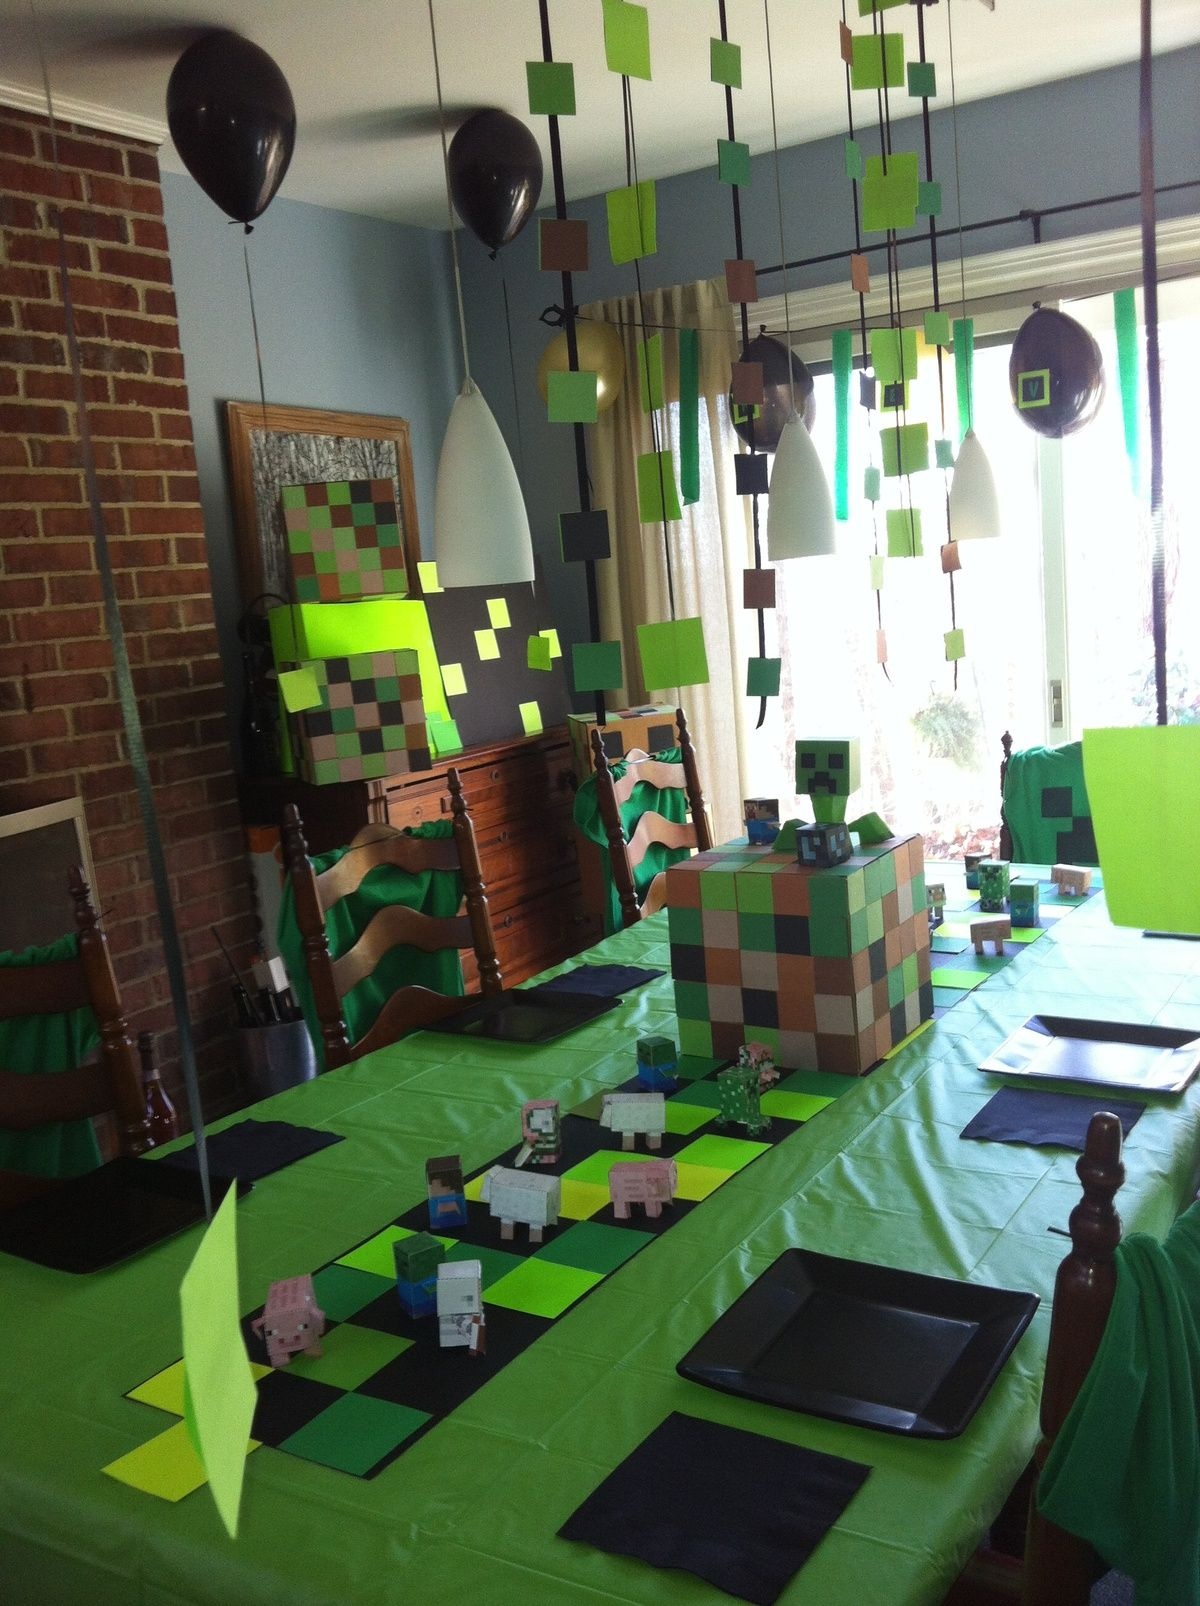 Mine craft birthday ideas - Mine Craft Birthday Ideas 31